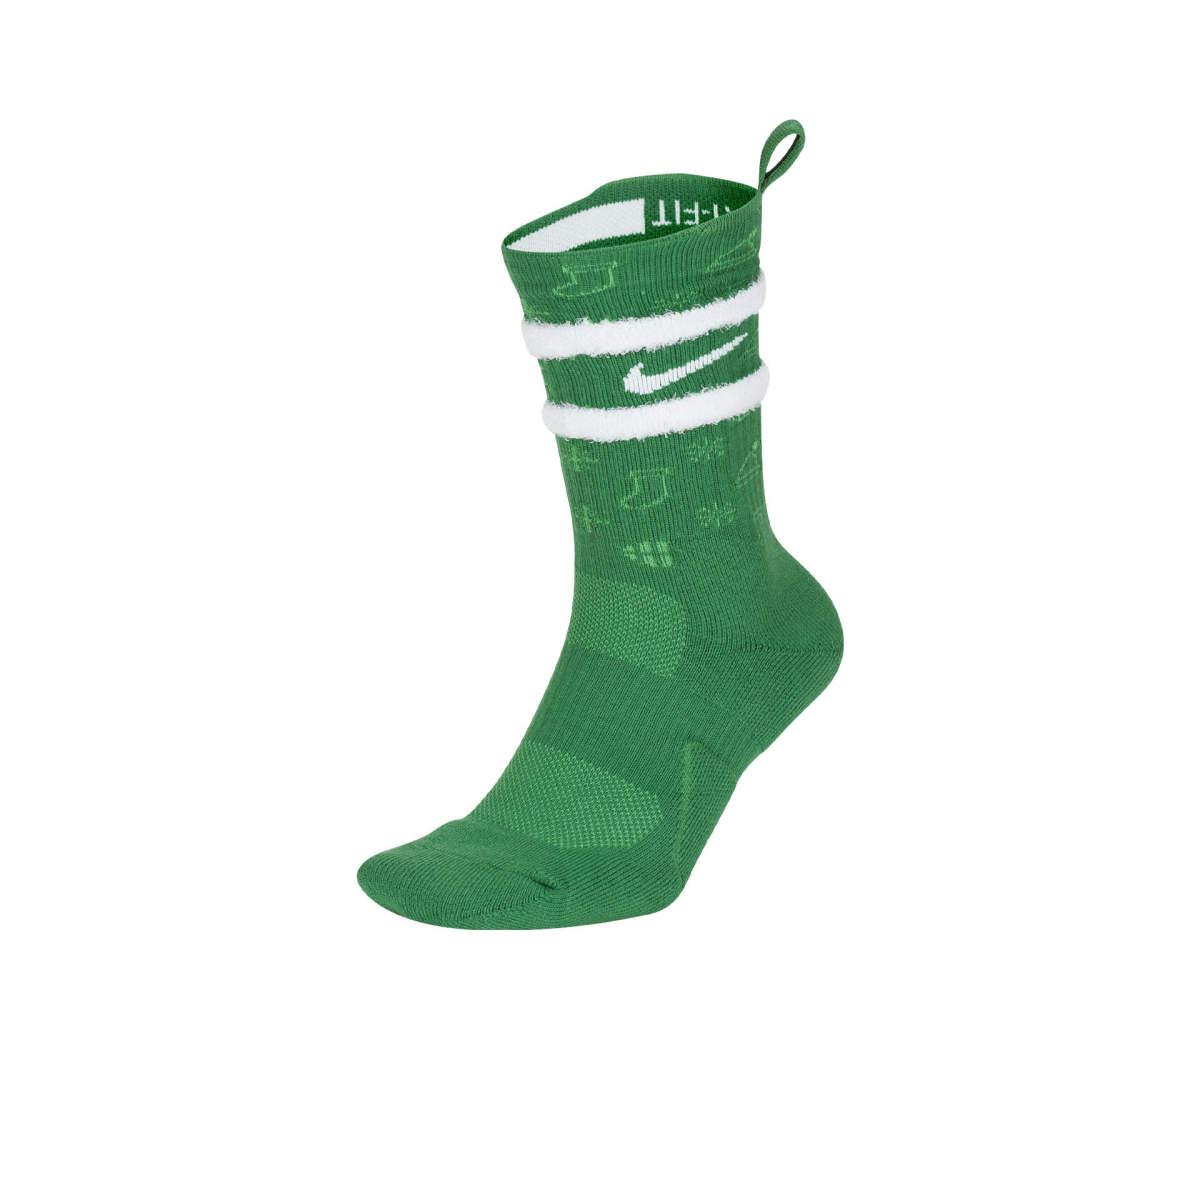 Elite xmas socks green